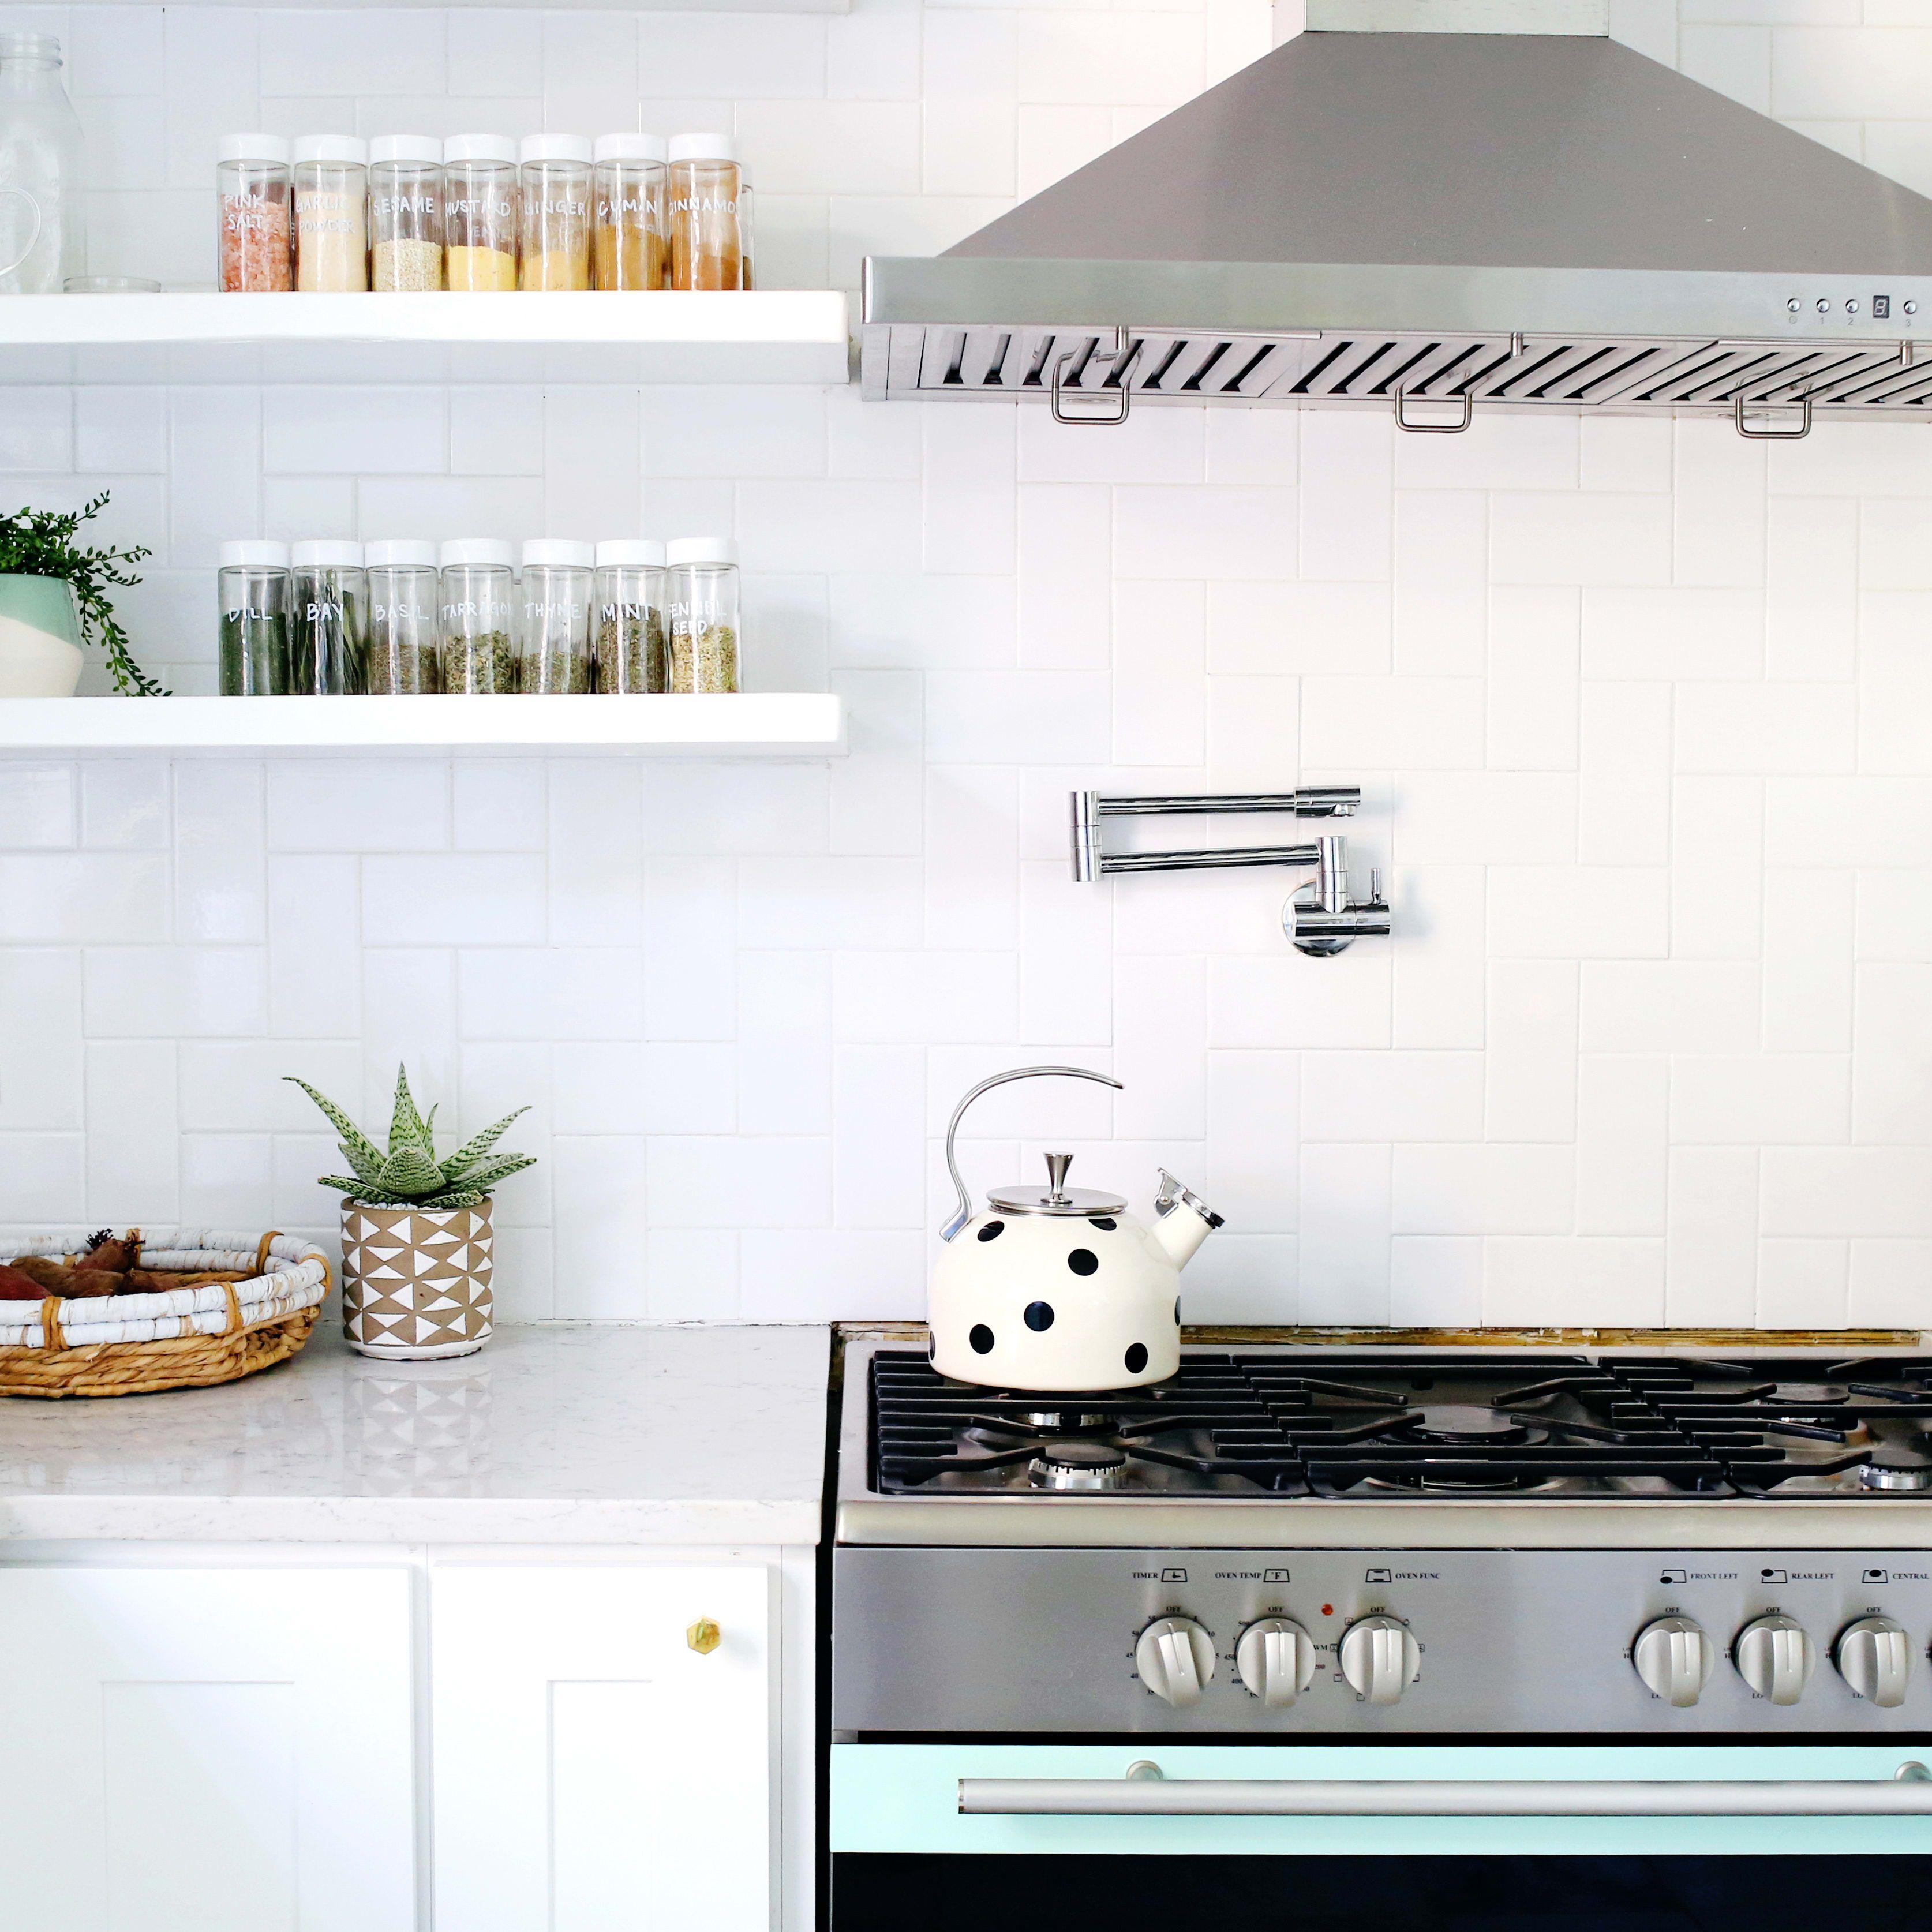 12 clever tupperware storage ideas your cluttered kitchen deserves the home edit tidy kitchen on kitchen organization tupperware id=34206